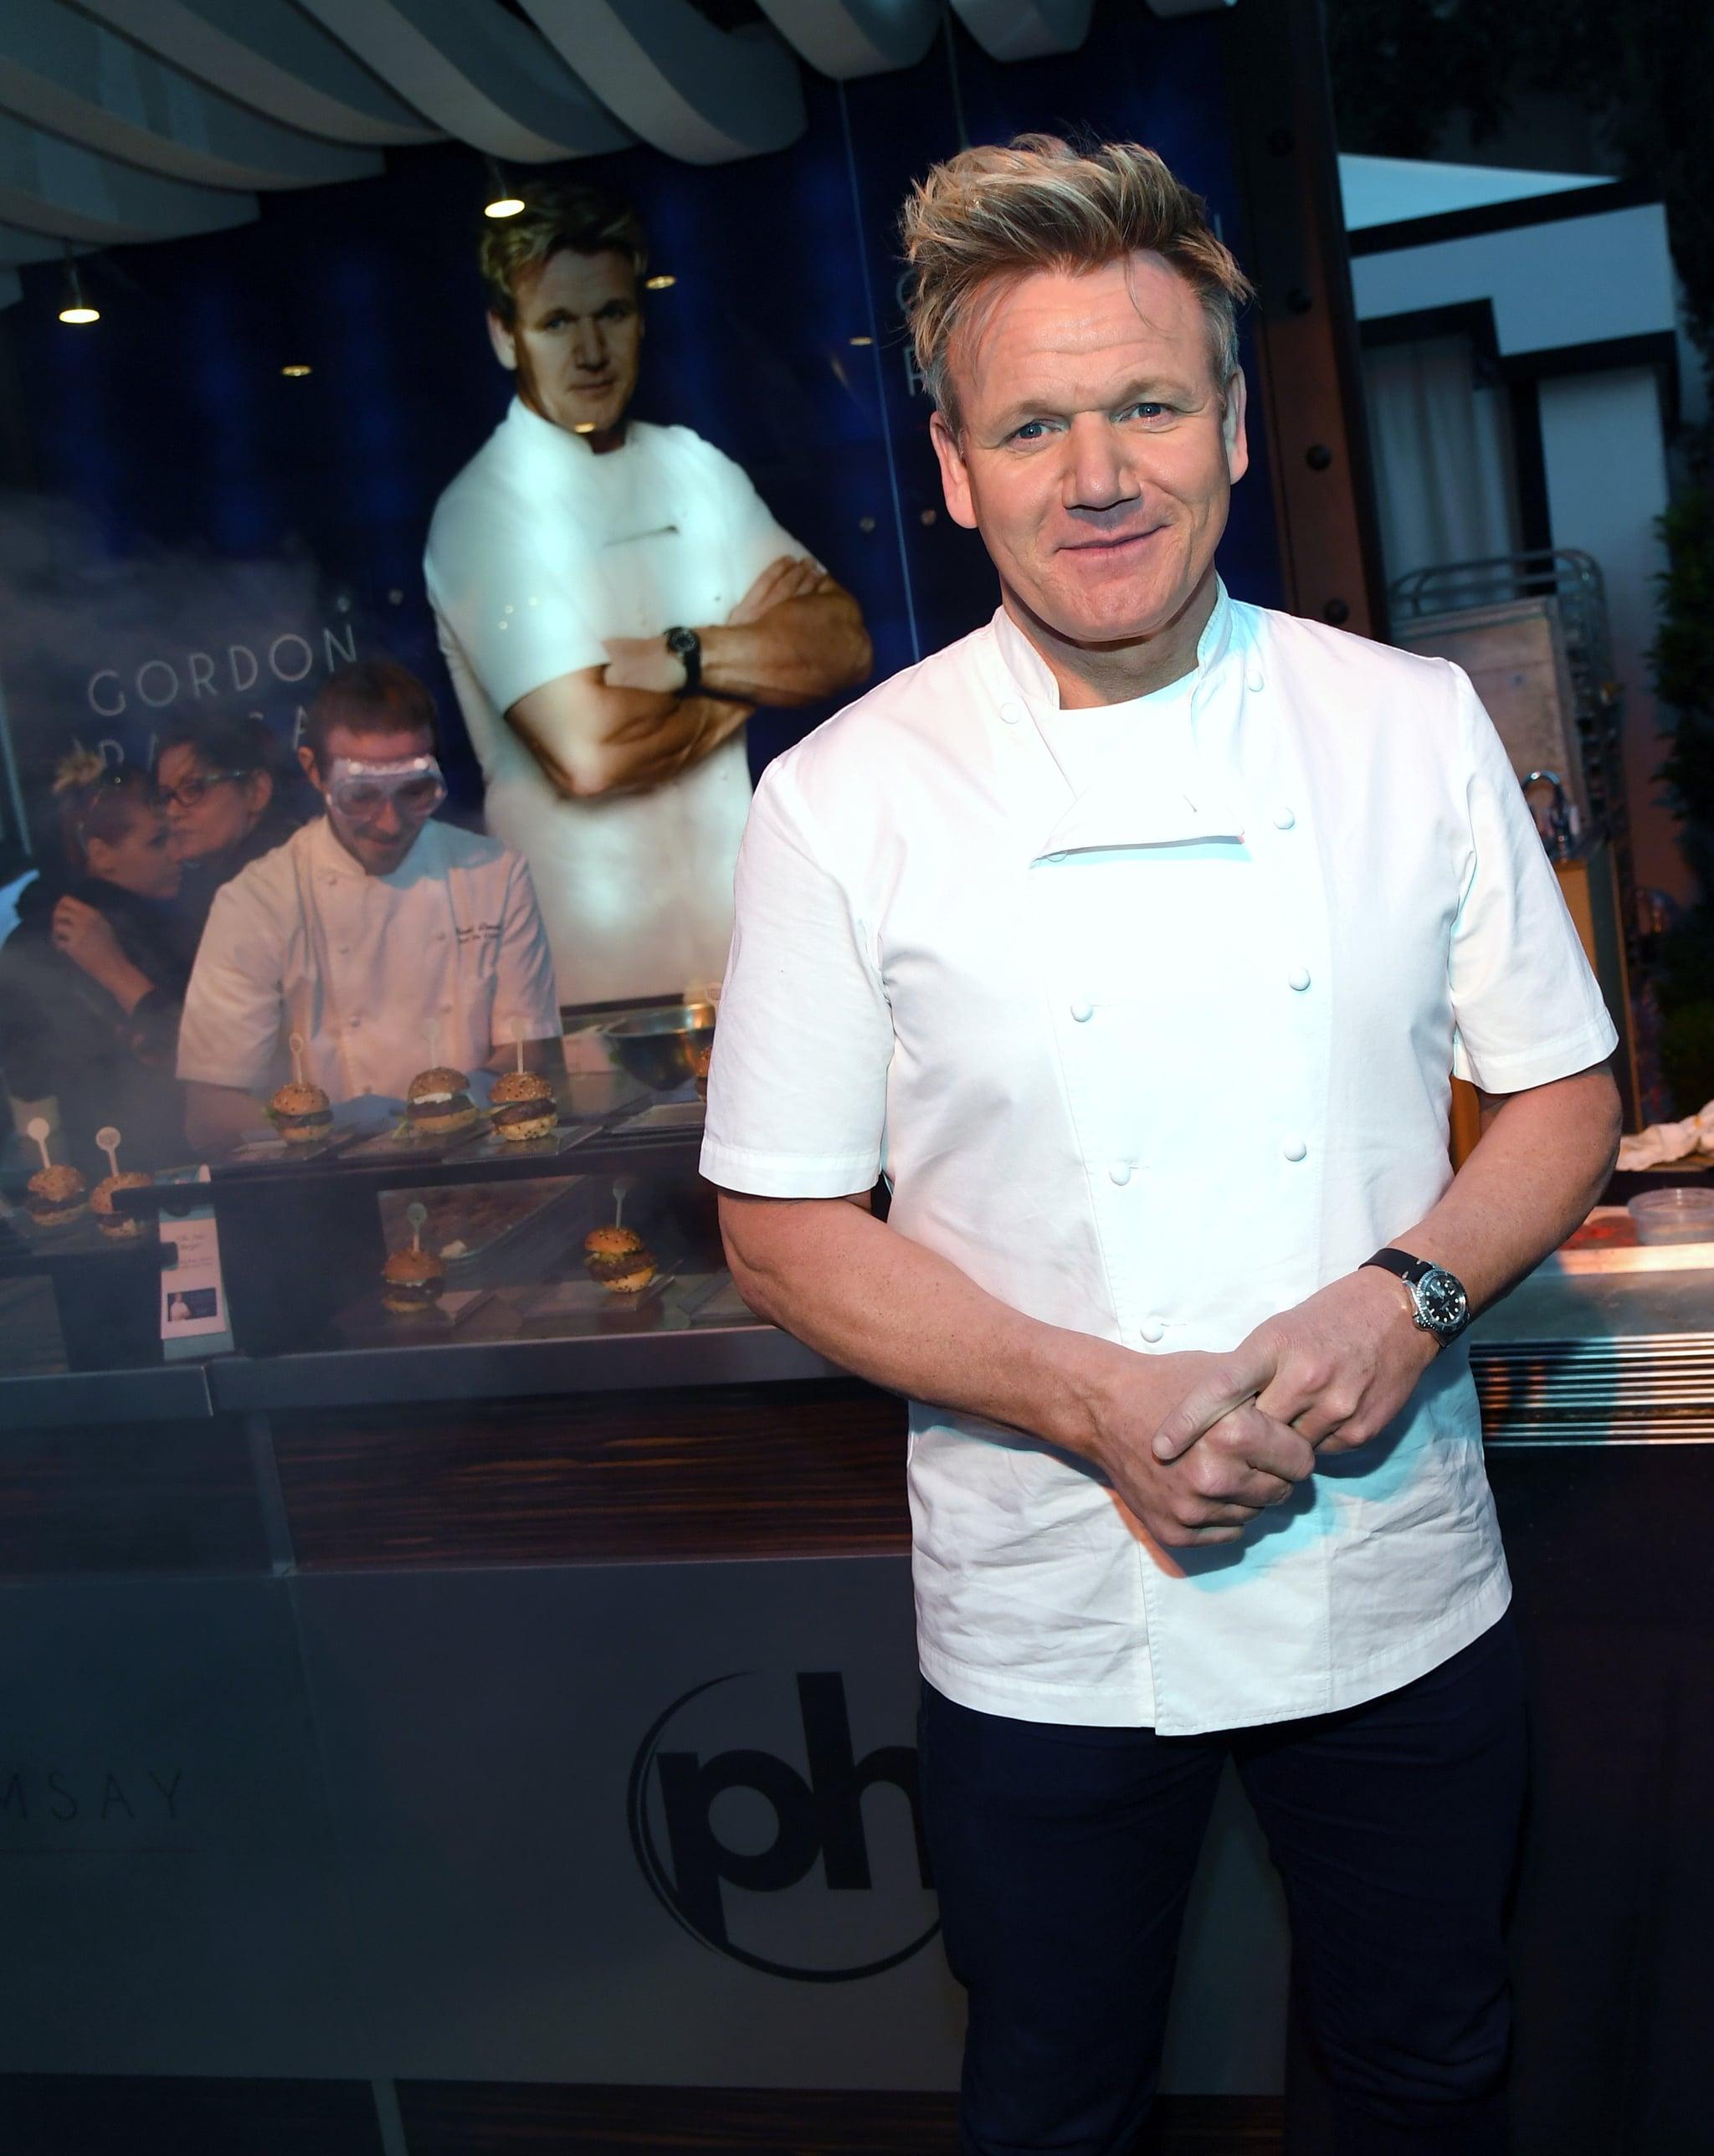 Gordon Ramsay Hell's Kitchen Restaurant | POPSUGAR Food